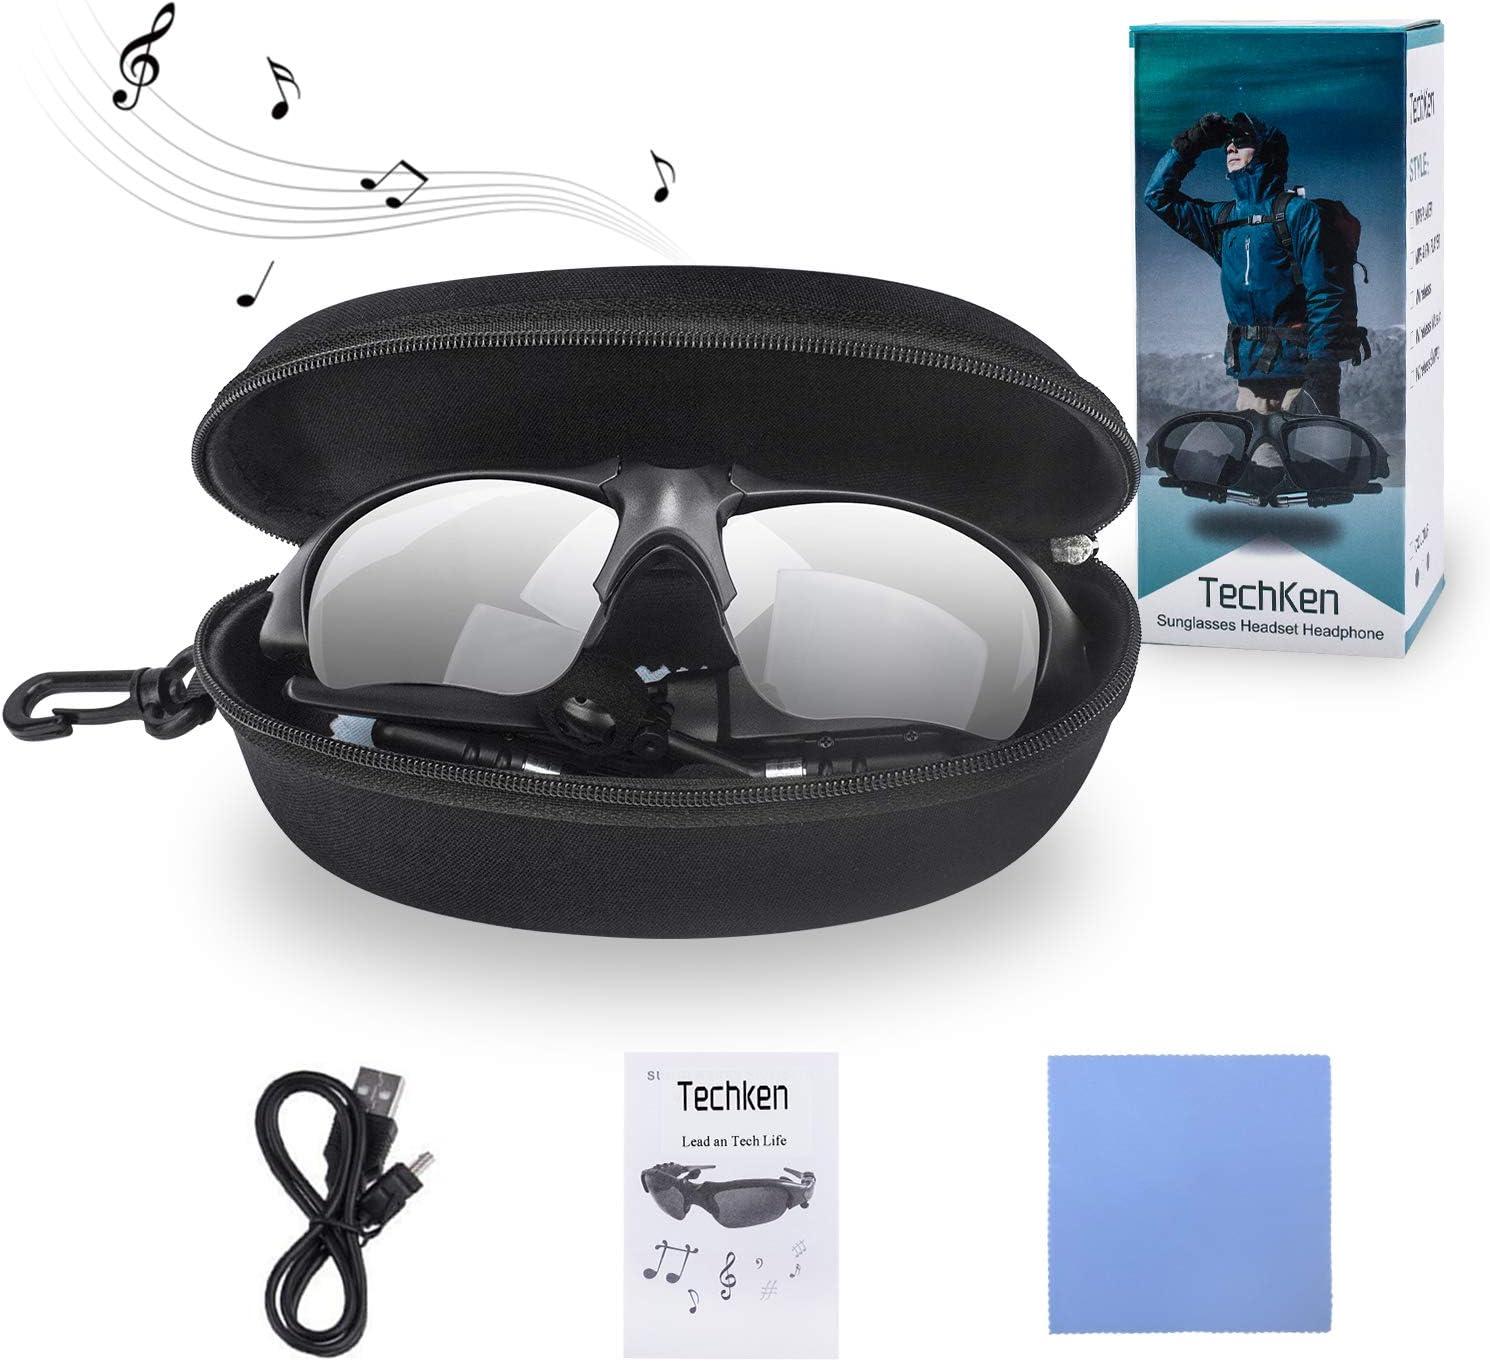 TechKen Sunglasses Headset Headphone Bluetooth Wireless Music Sunglasses Headsets